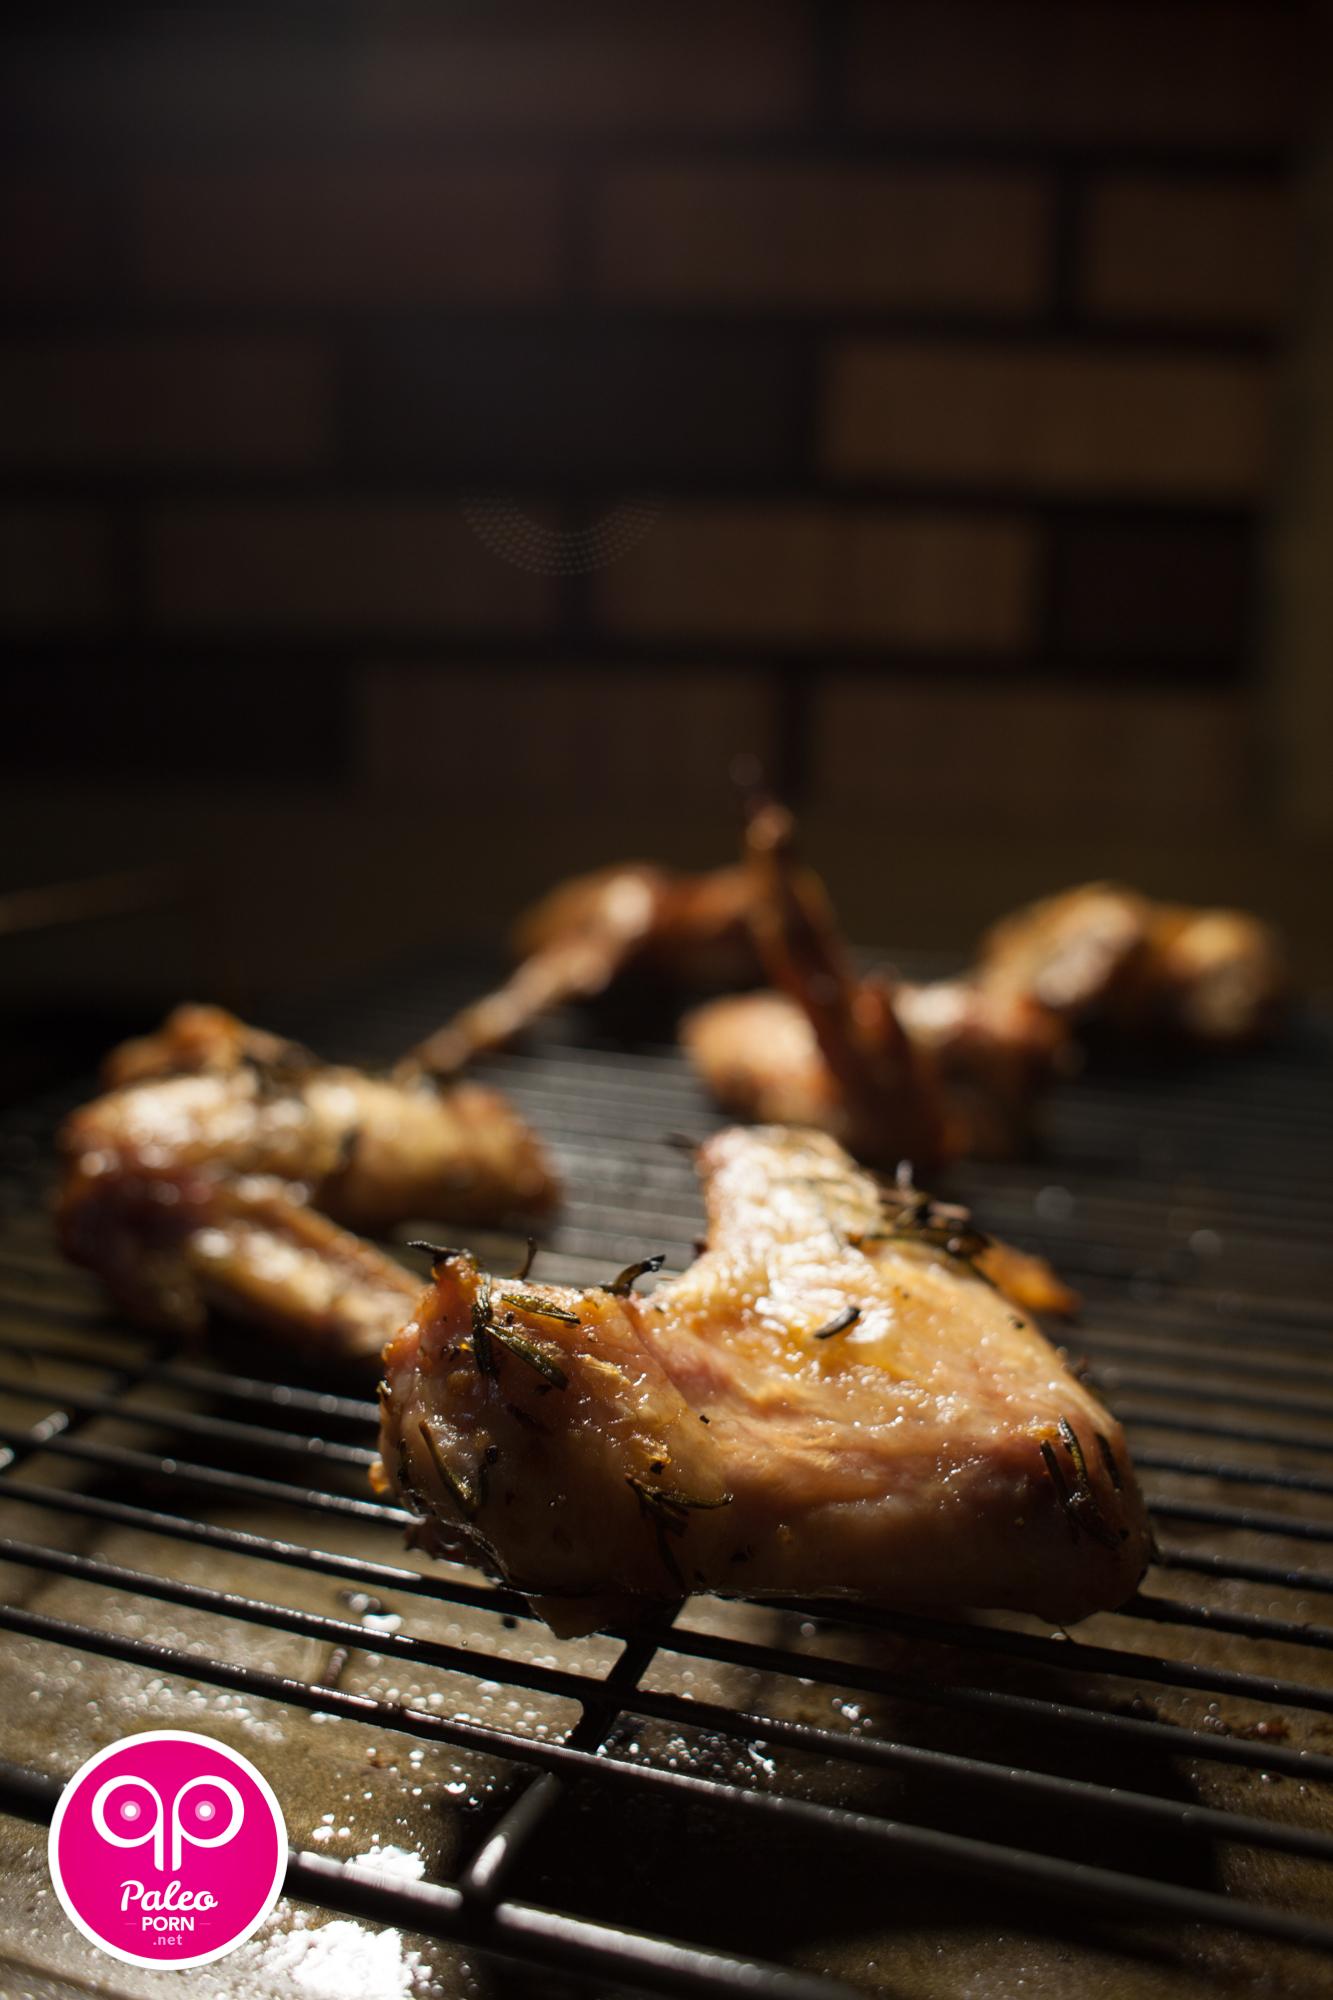 Rosemary Paleo Chicken Wings